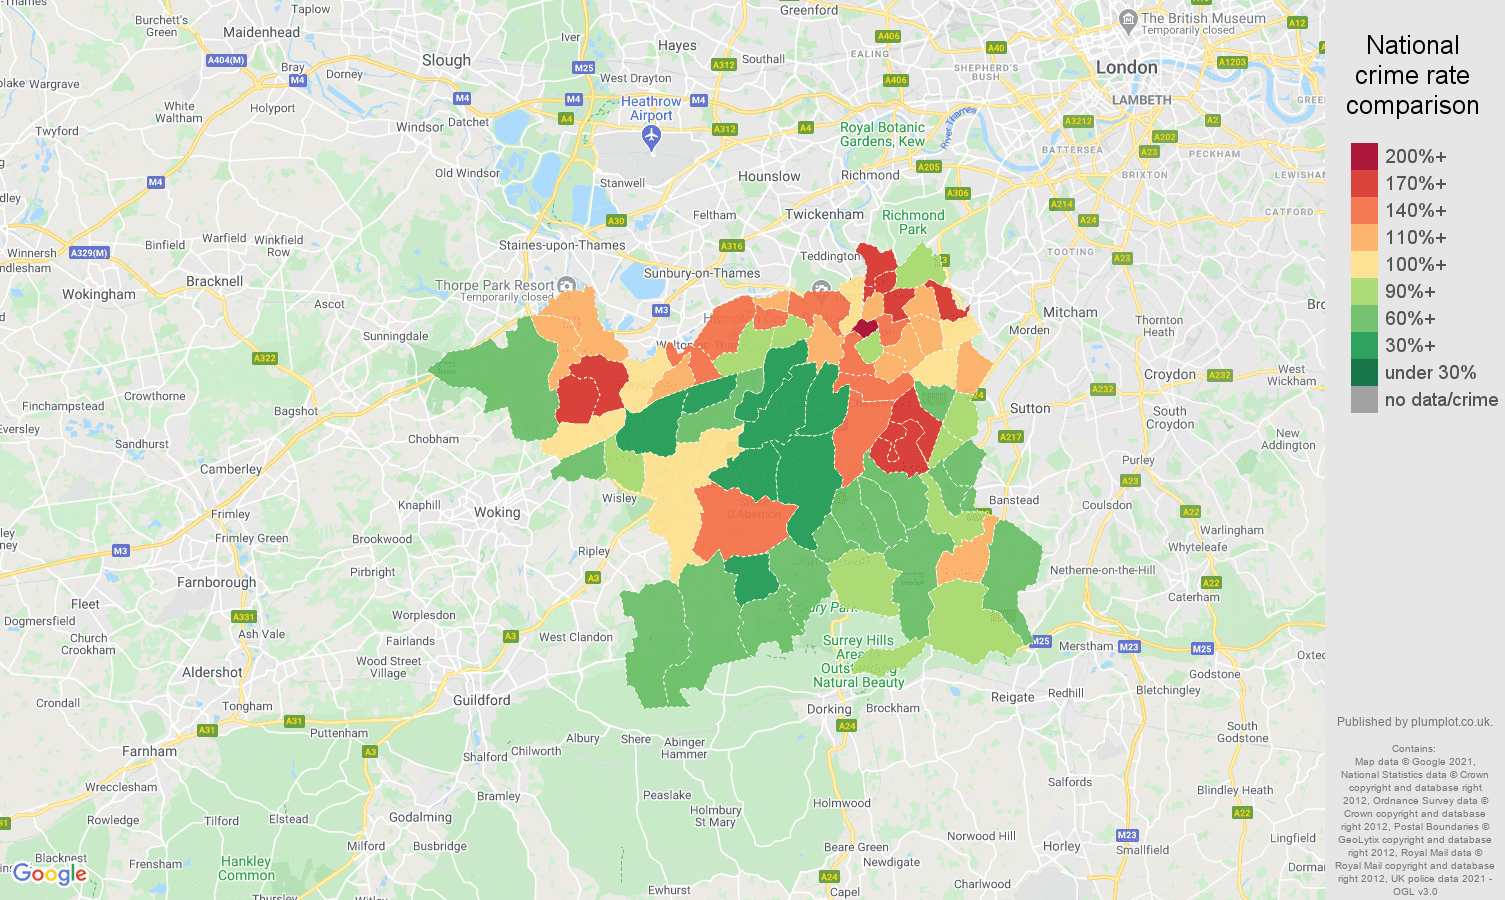 Kingston upon Thames antisocial behaviour crime rate comparison map